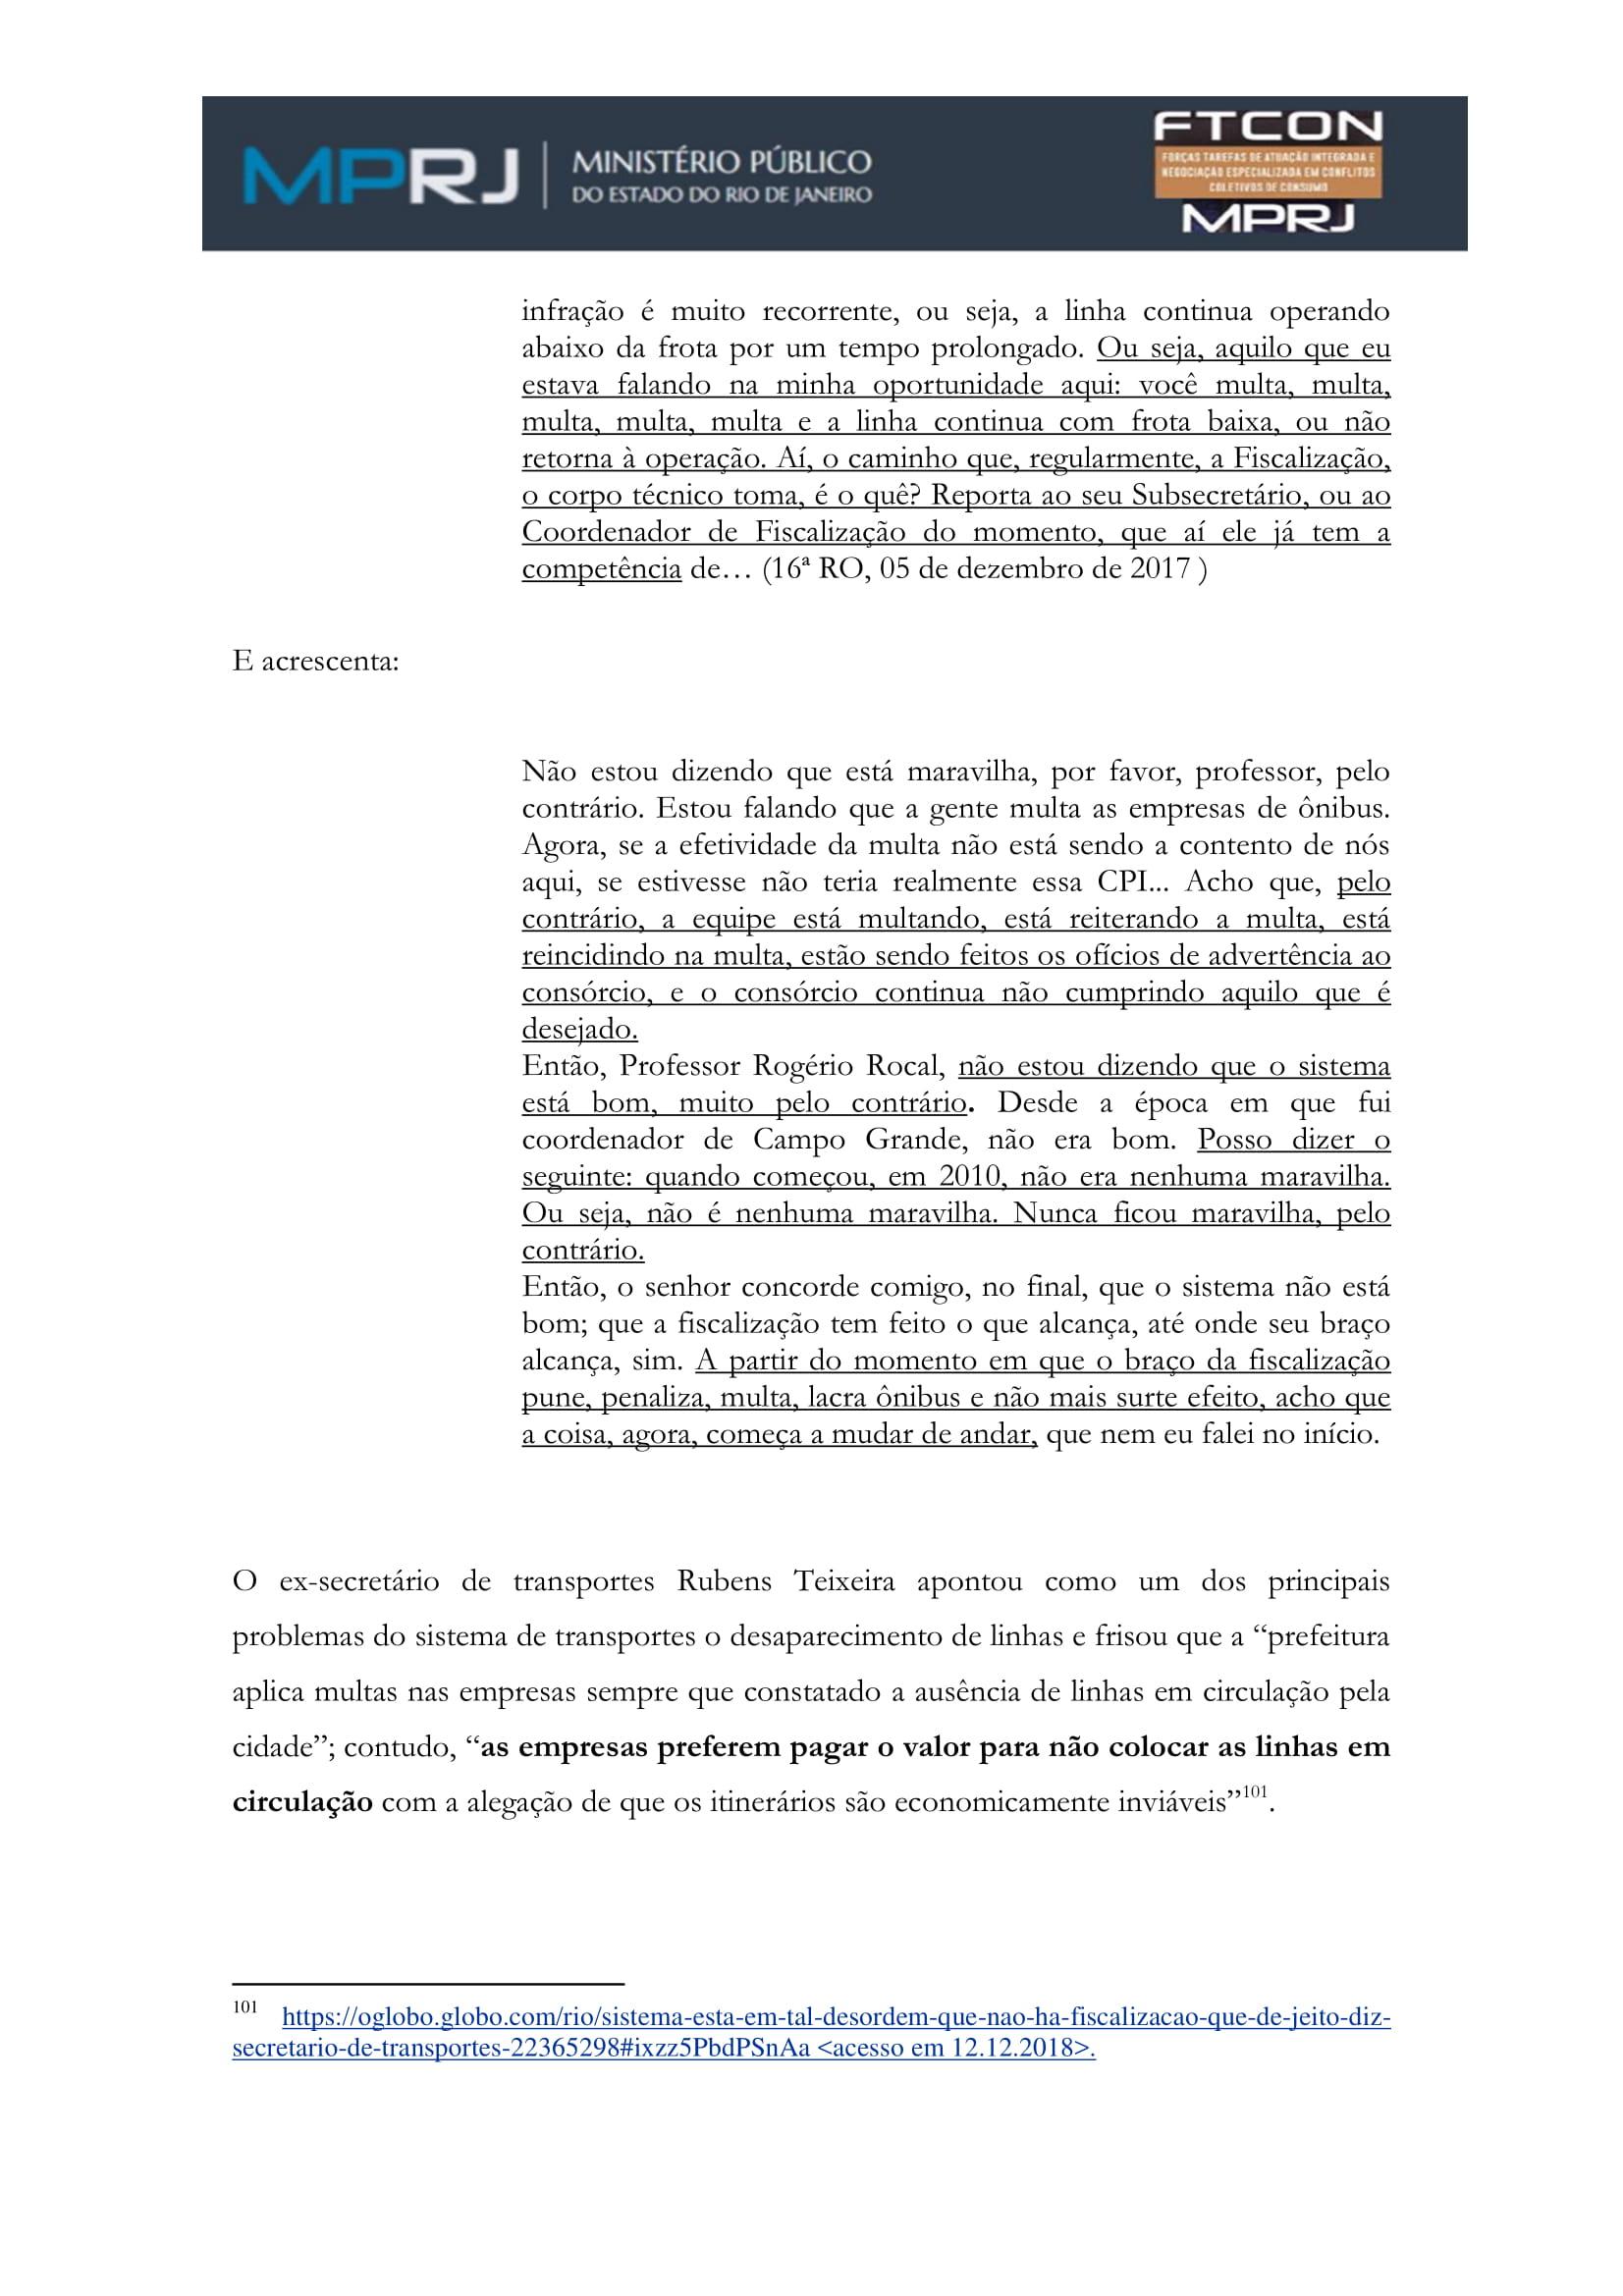 acp_caducidade_onibus_dr_rt-110